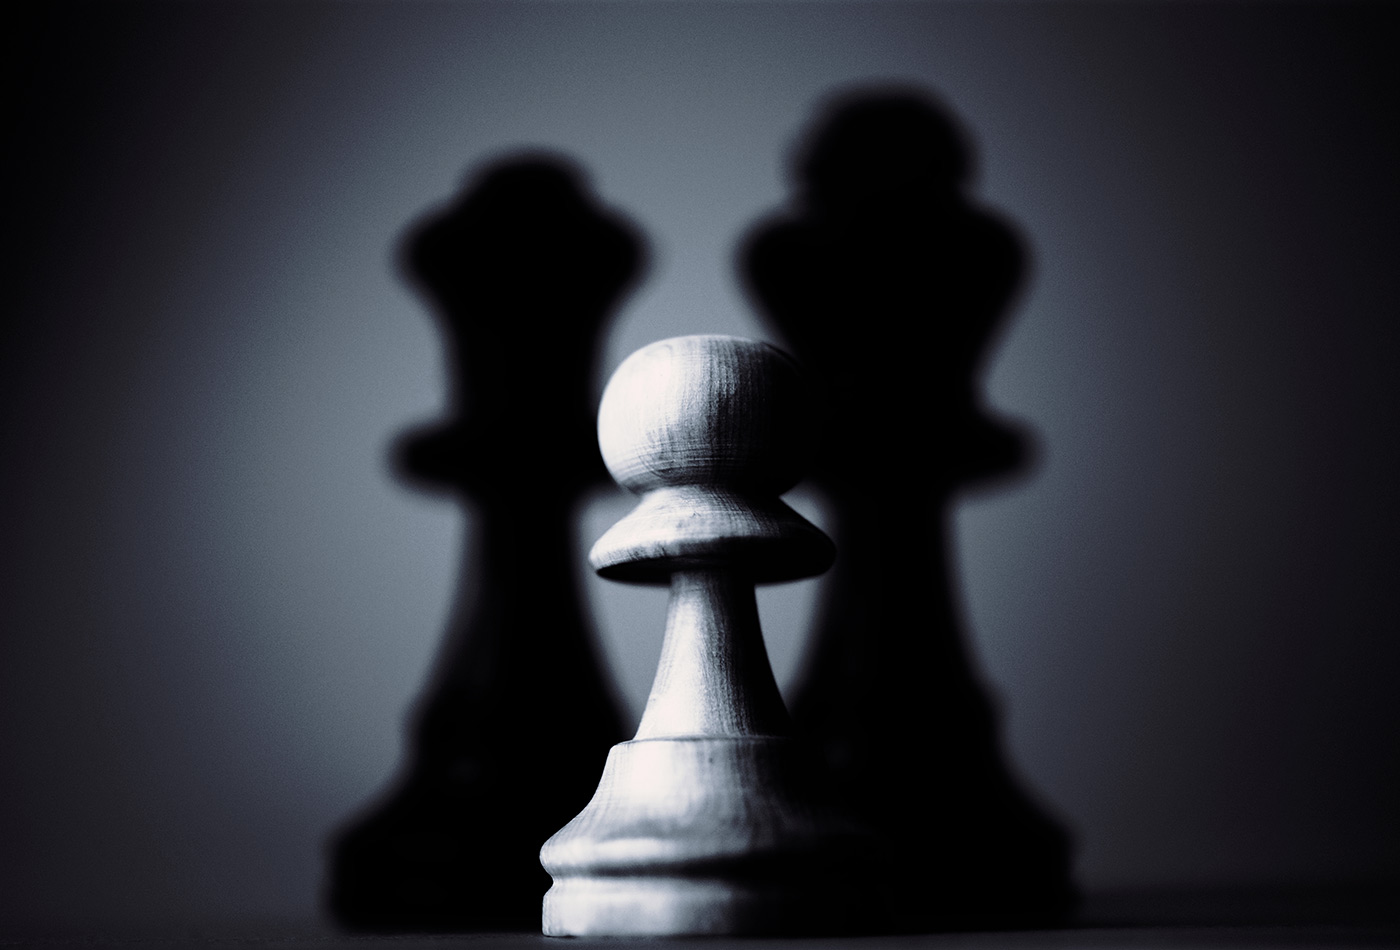 Shadow chess